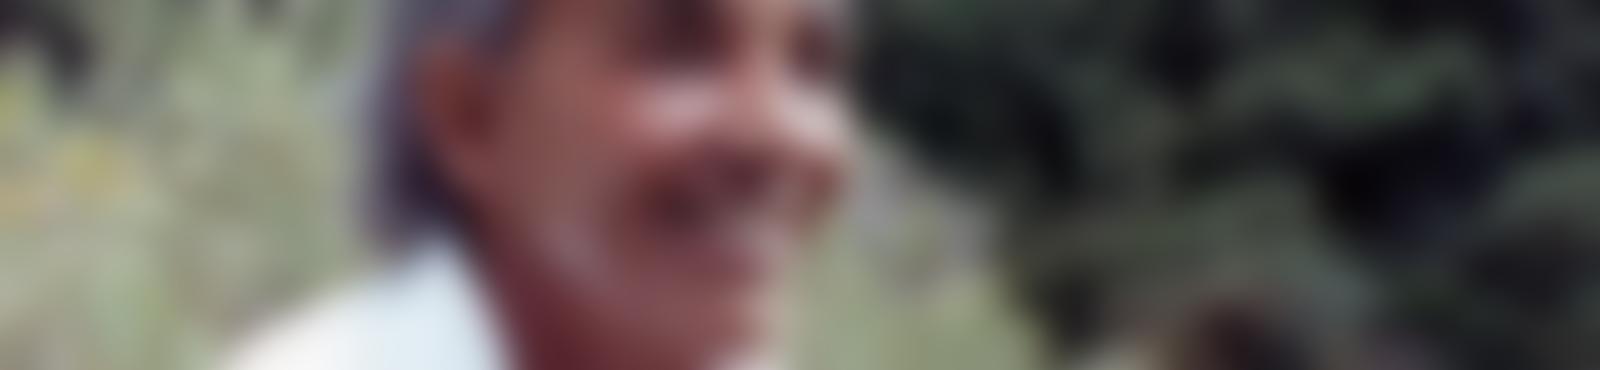 Blurred 7c7191bc 048b 4824 8792 186c05ea2e41